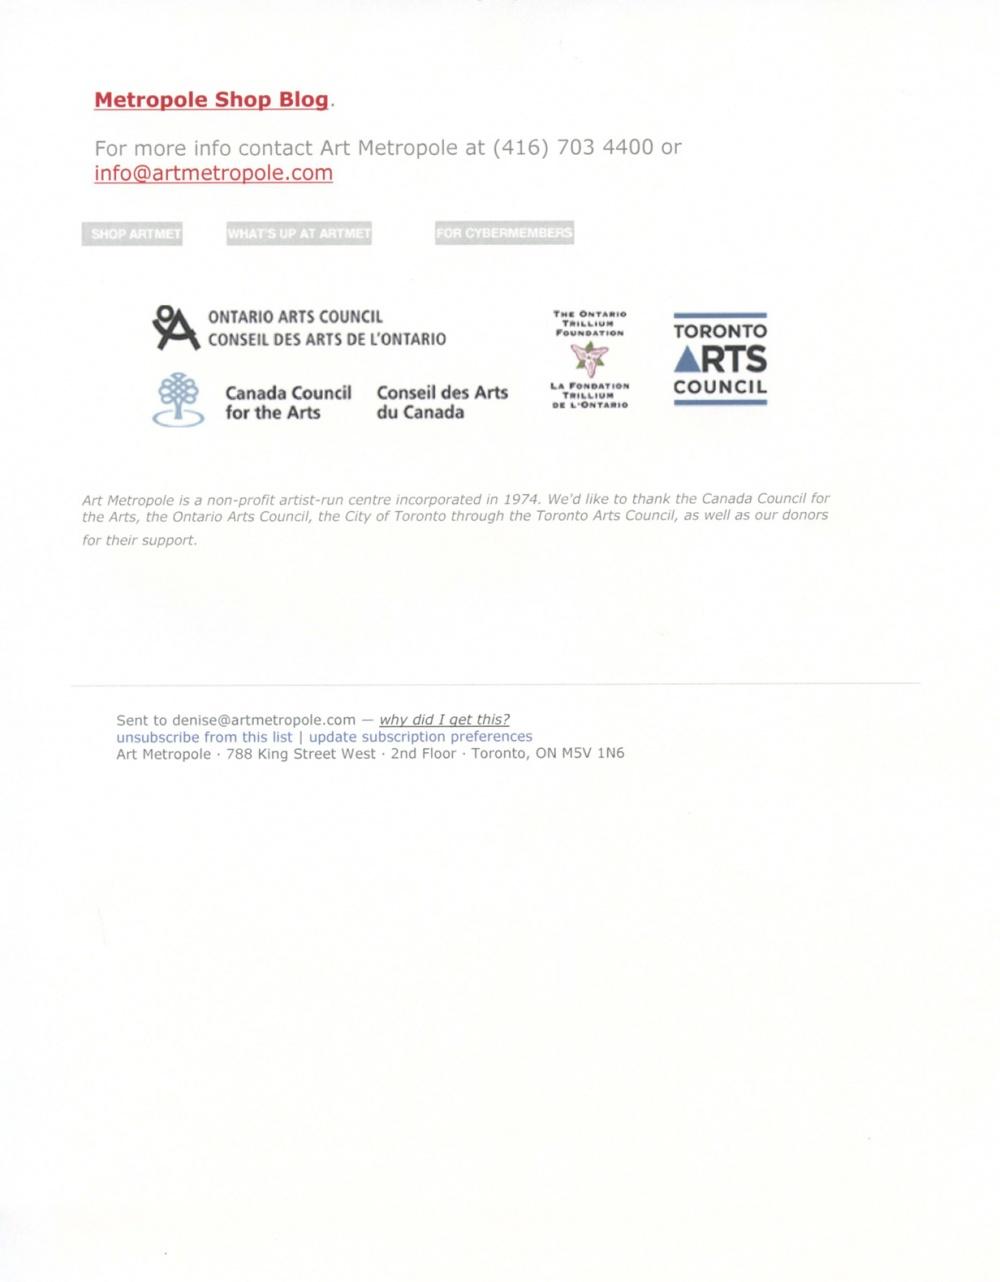 AMA1212.1, page 3